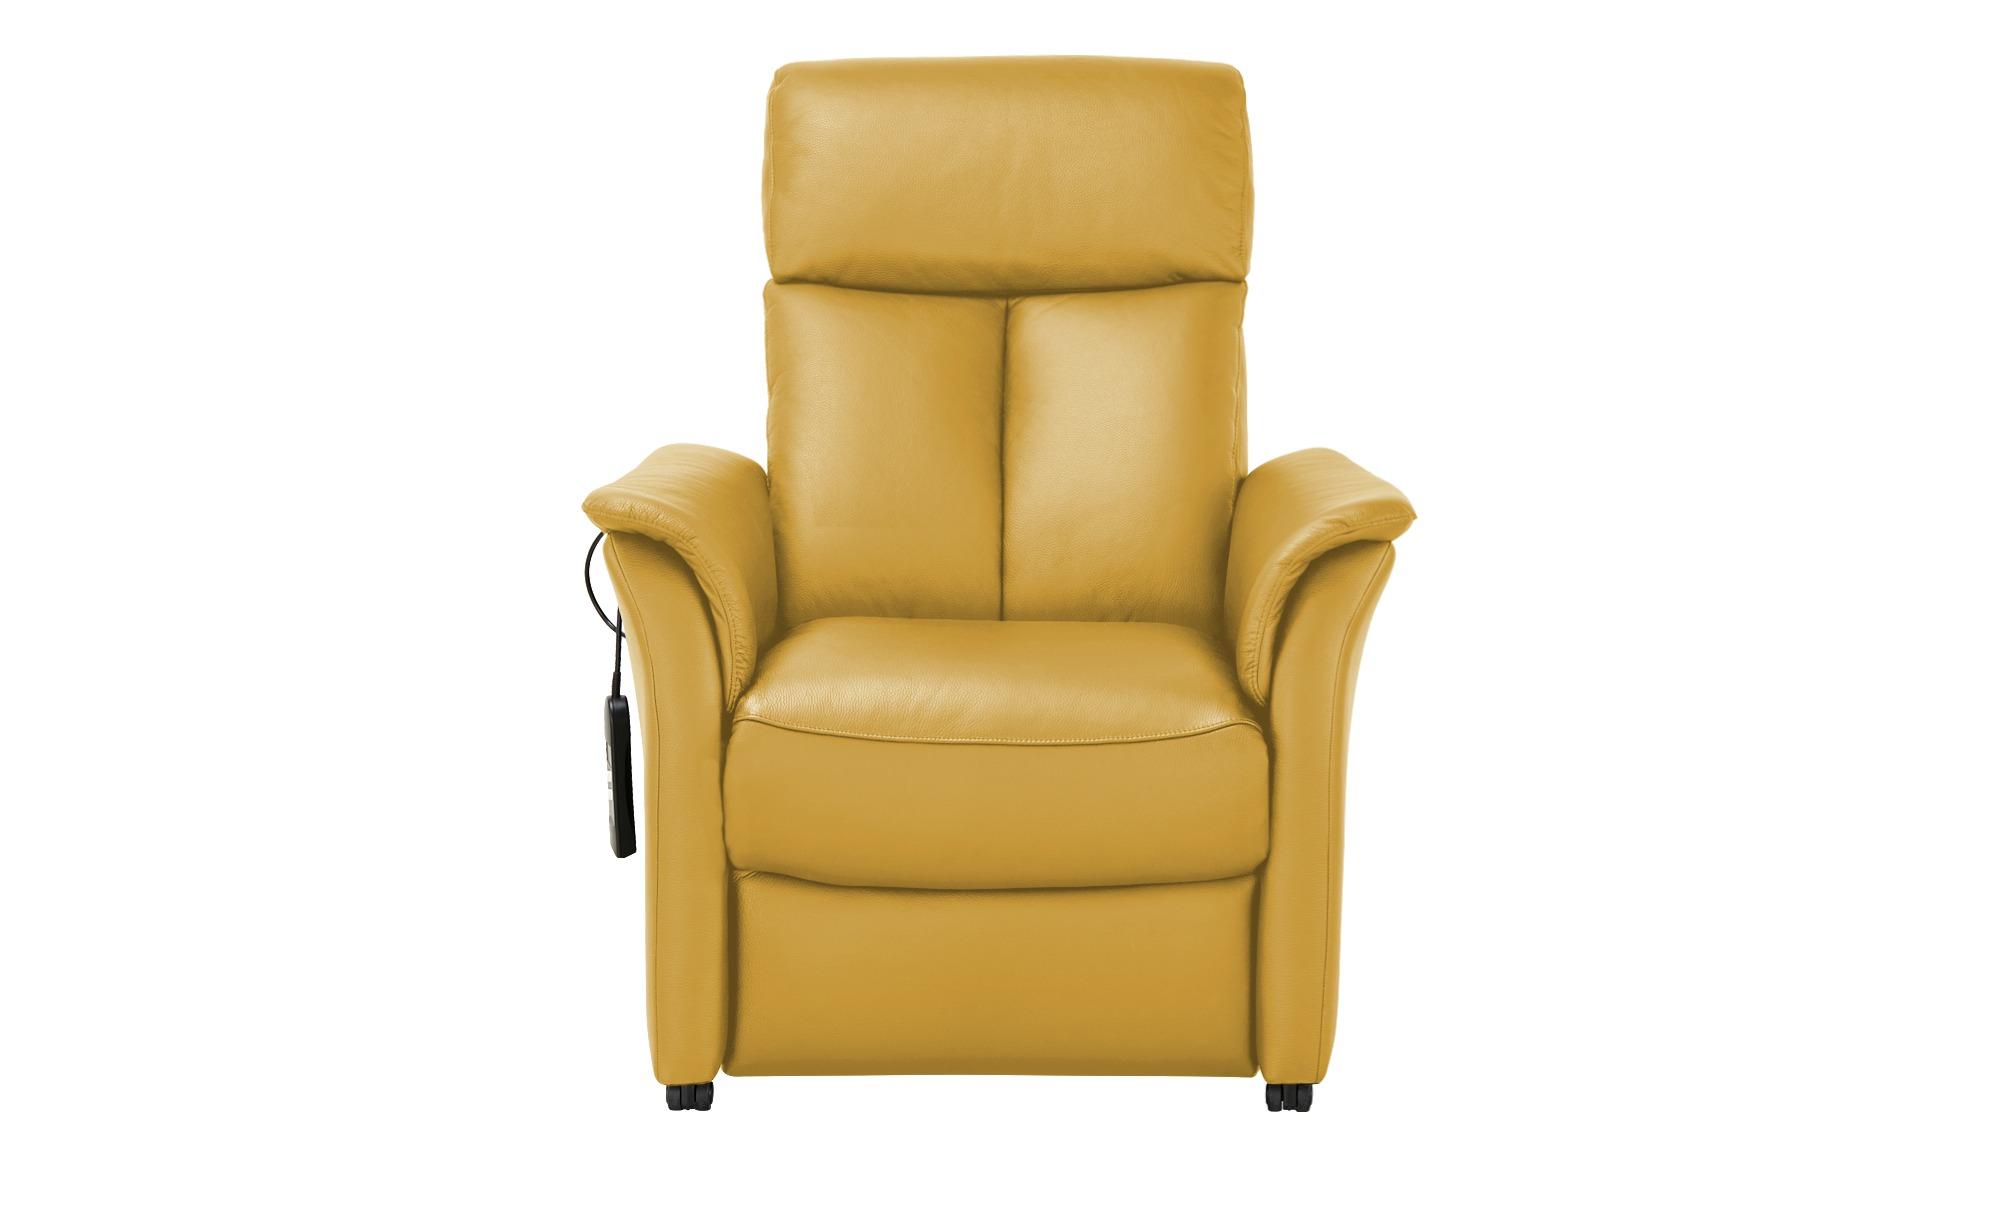 Nils Olsen Fernsehsessel M  Agda ¦ gelb ¦ Maße (cm): B: 85 H: 110 T: 85 Polstermöbel > Sessel > Ledersessel - Höffner